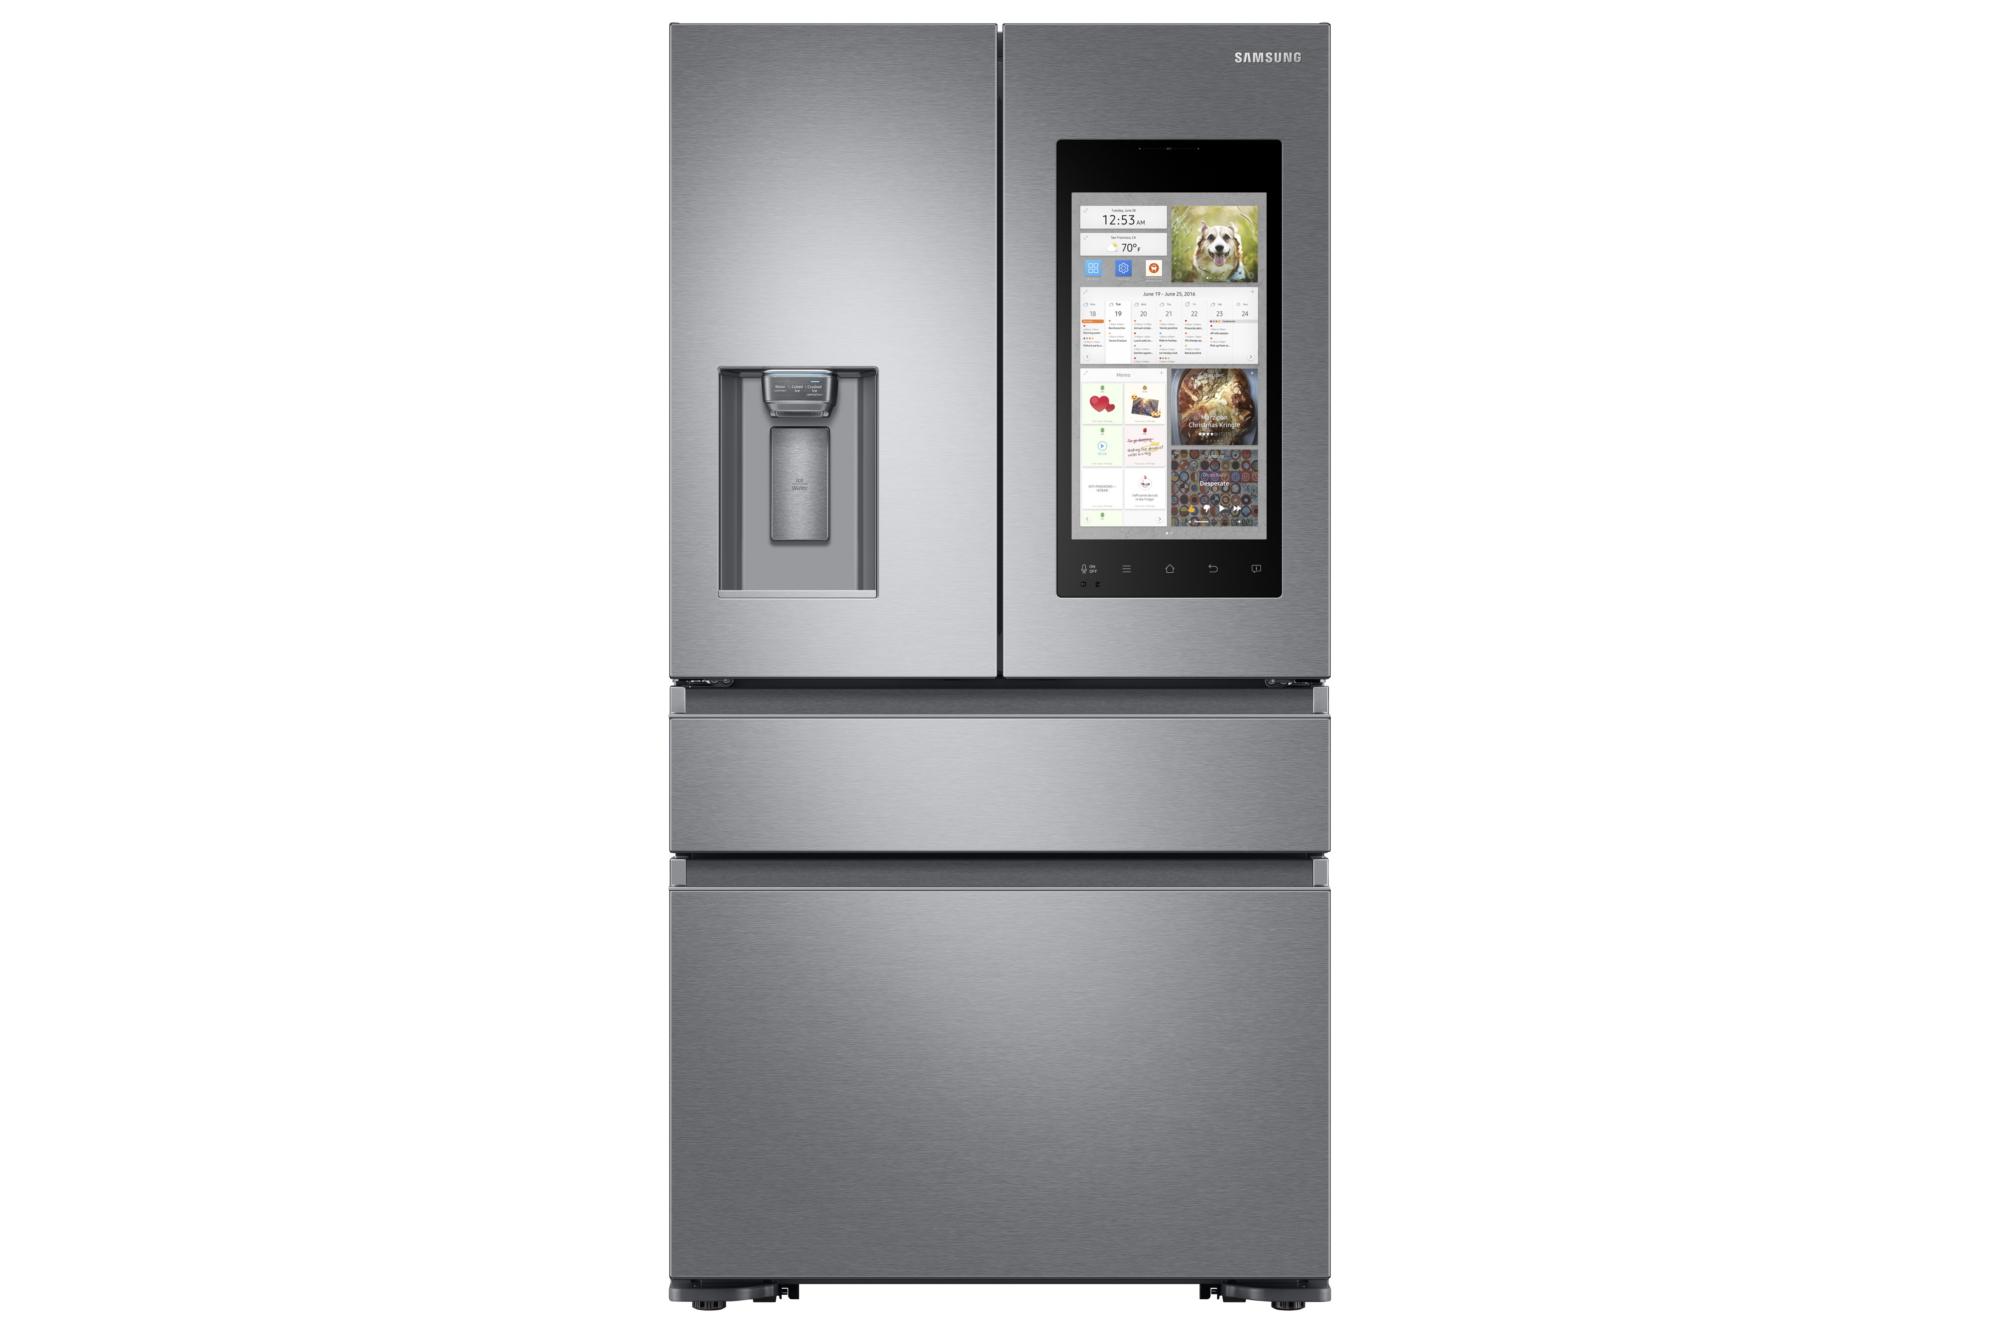 samsung nuovo frigorifero smart al ces 2017 leganerd